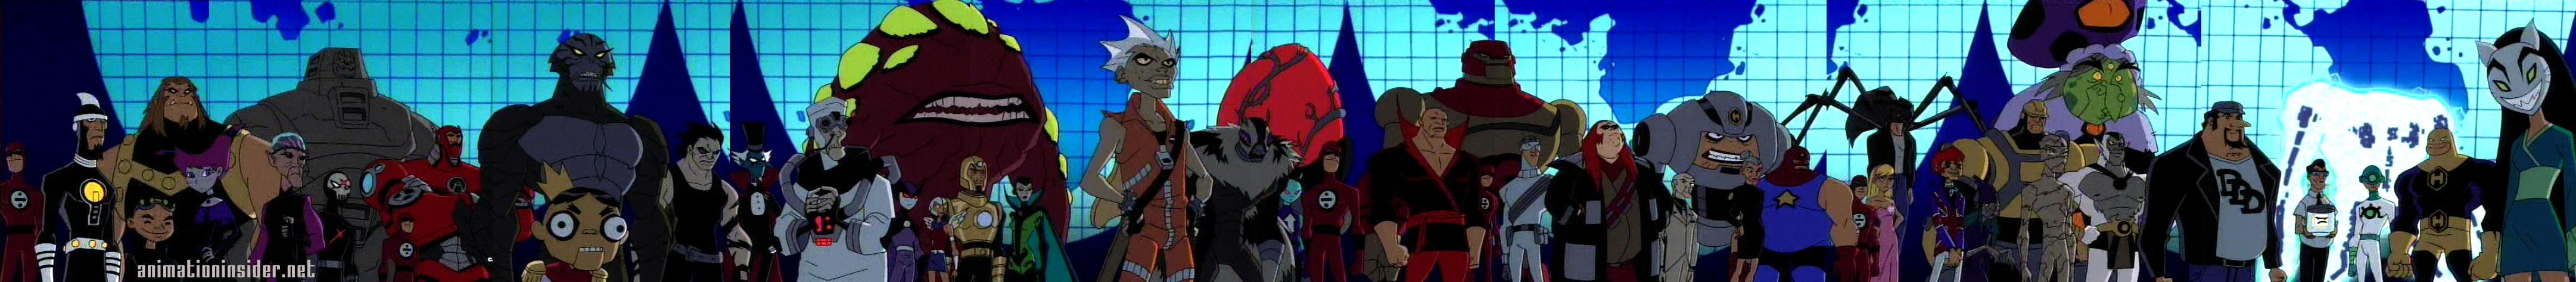 Teen Titans Villains 43